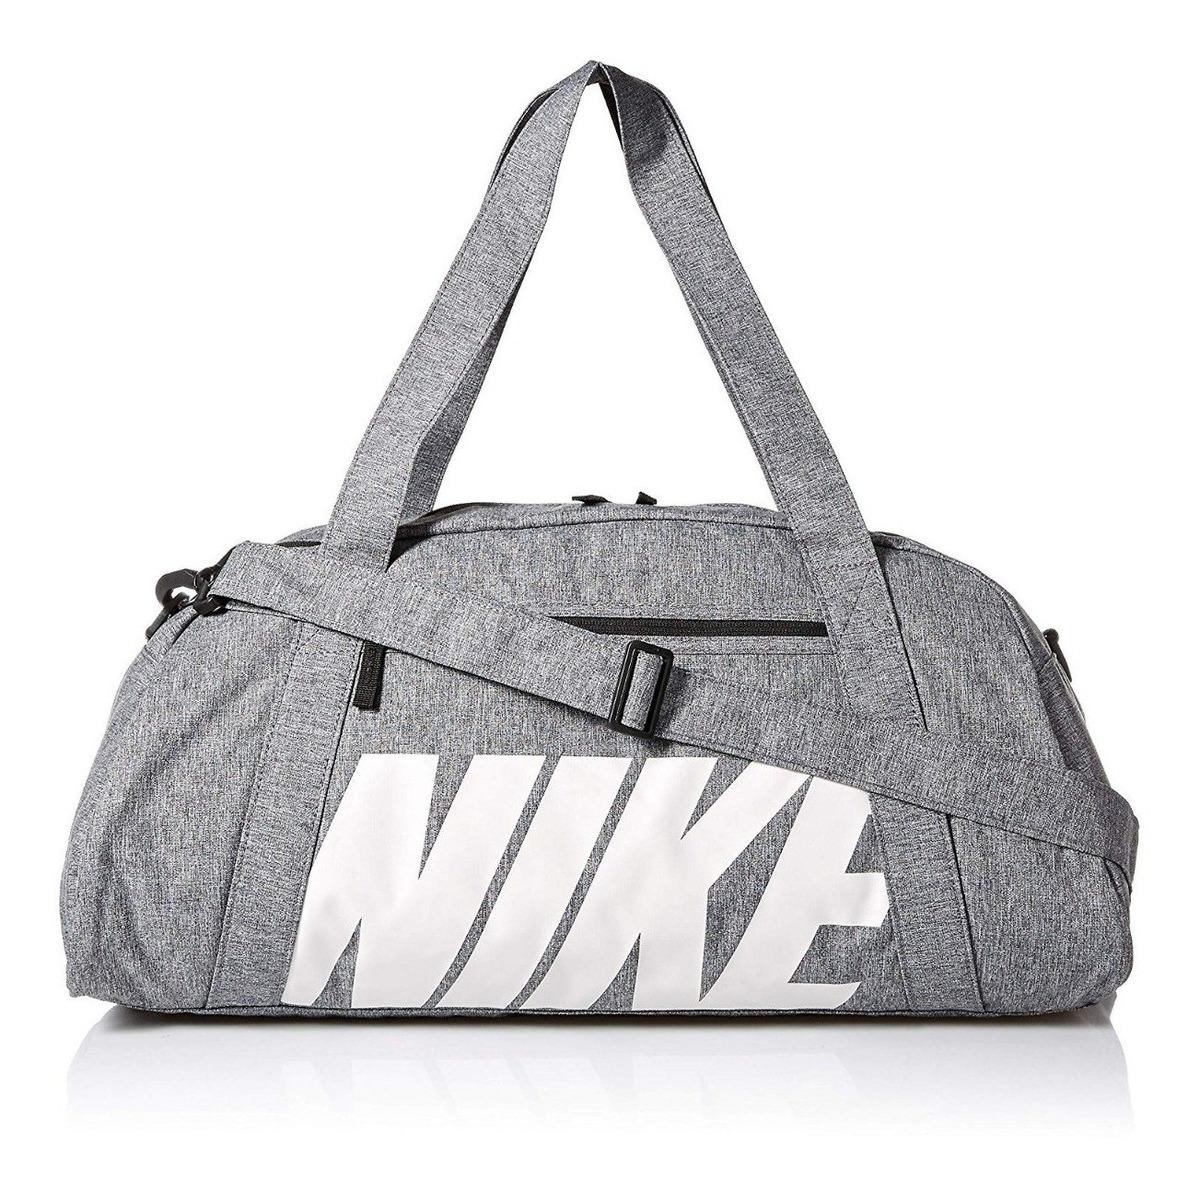 Mujer Para Deportiva Gratis Nike Oficial Bolsa Gym Envio NnP8k0wOX